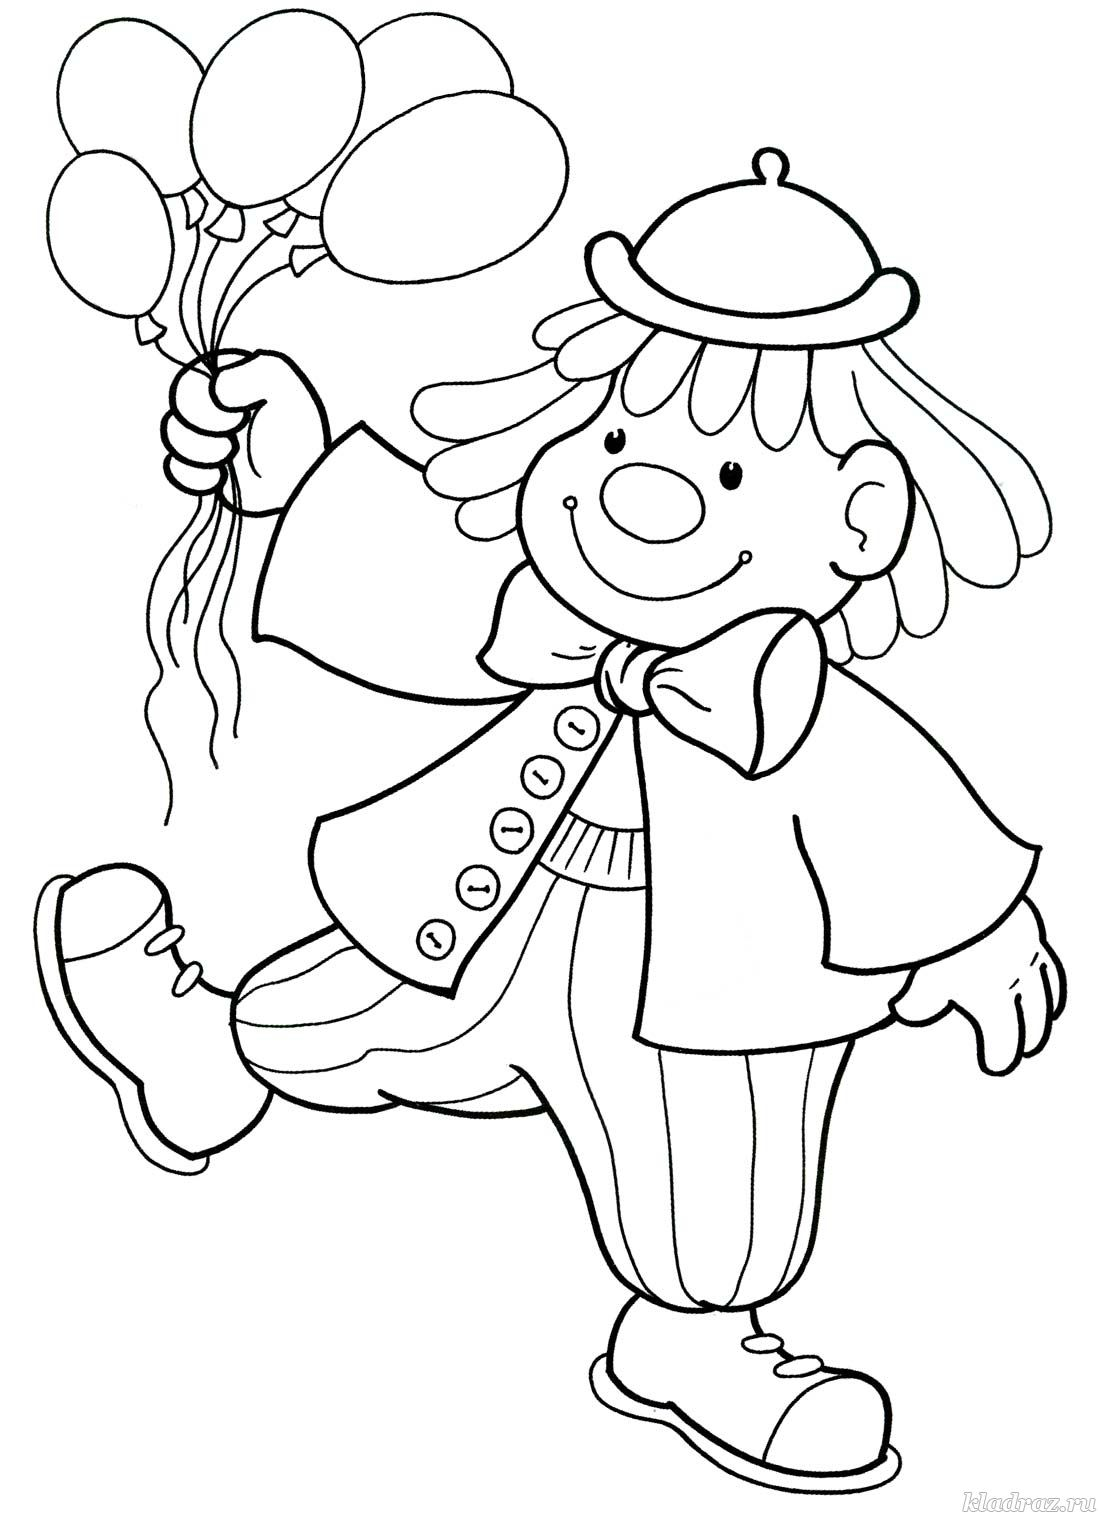 Клоун раскраска детям